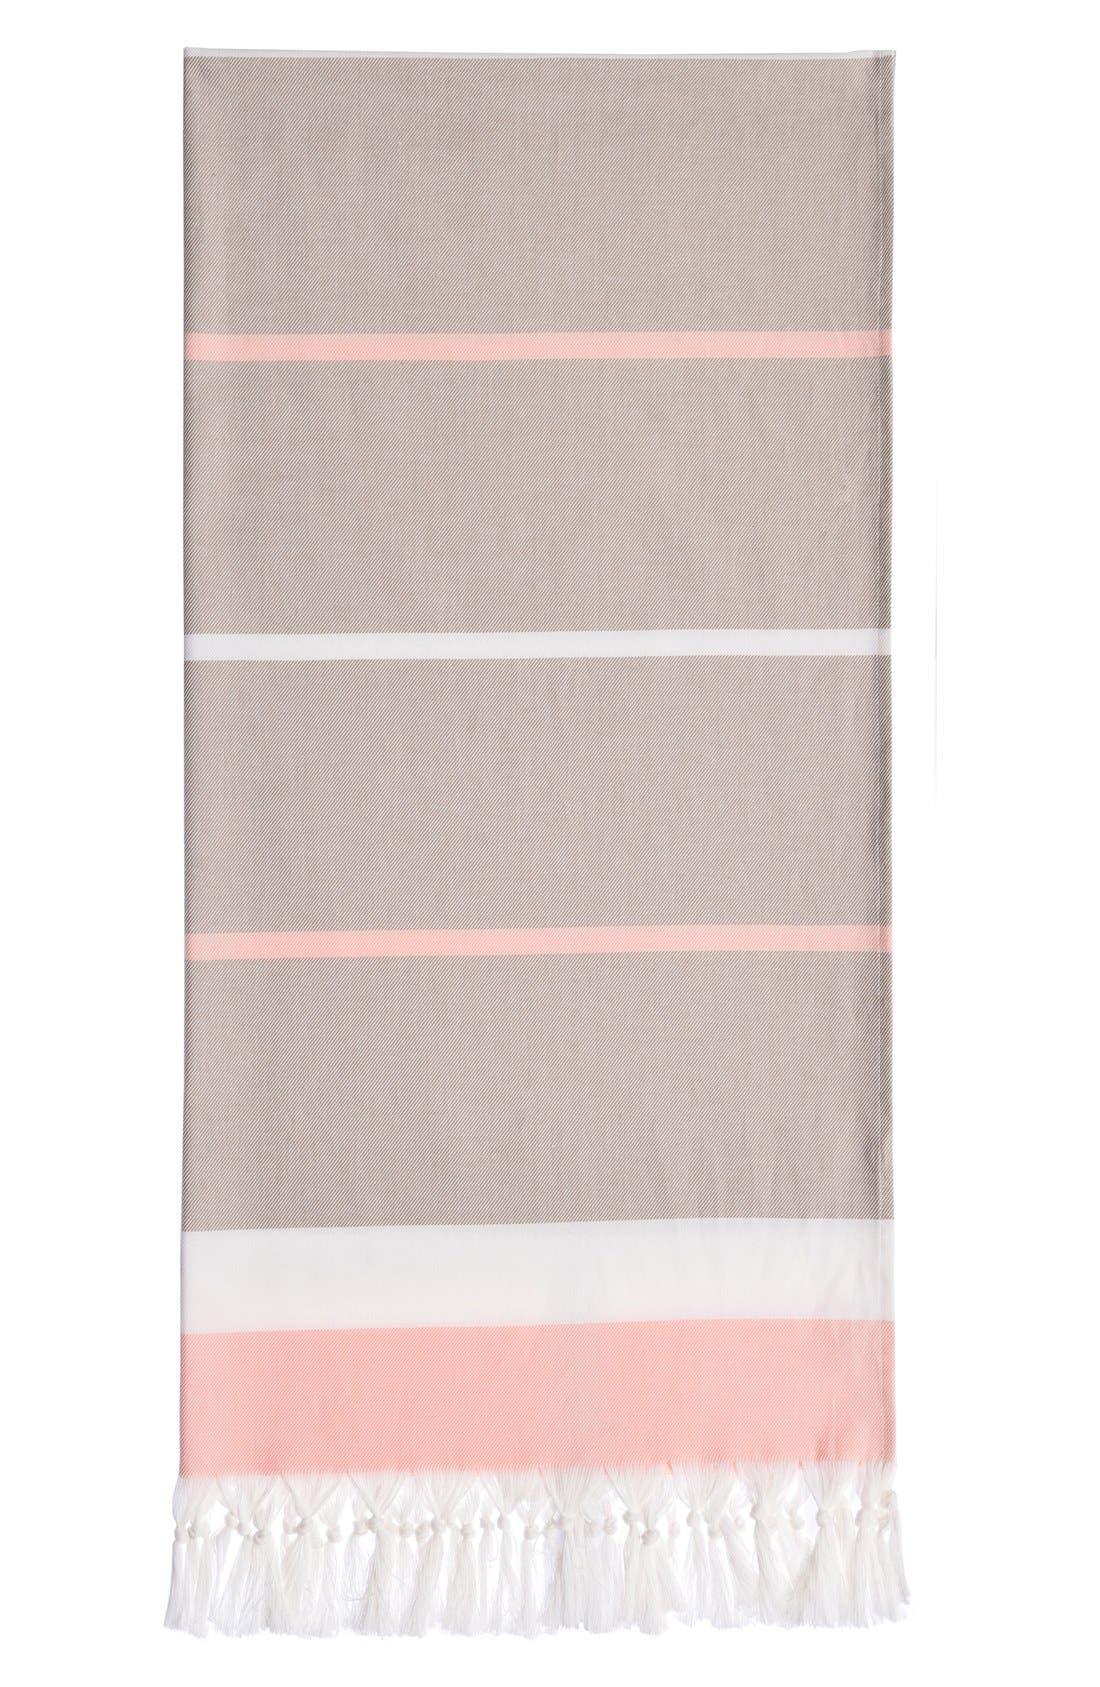 Linum Home Textiles 'Seaside Fun' Turkish Pestemal Towel